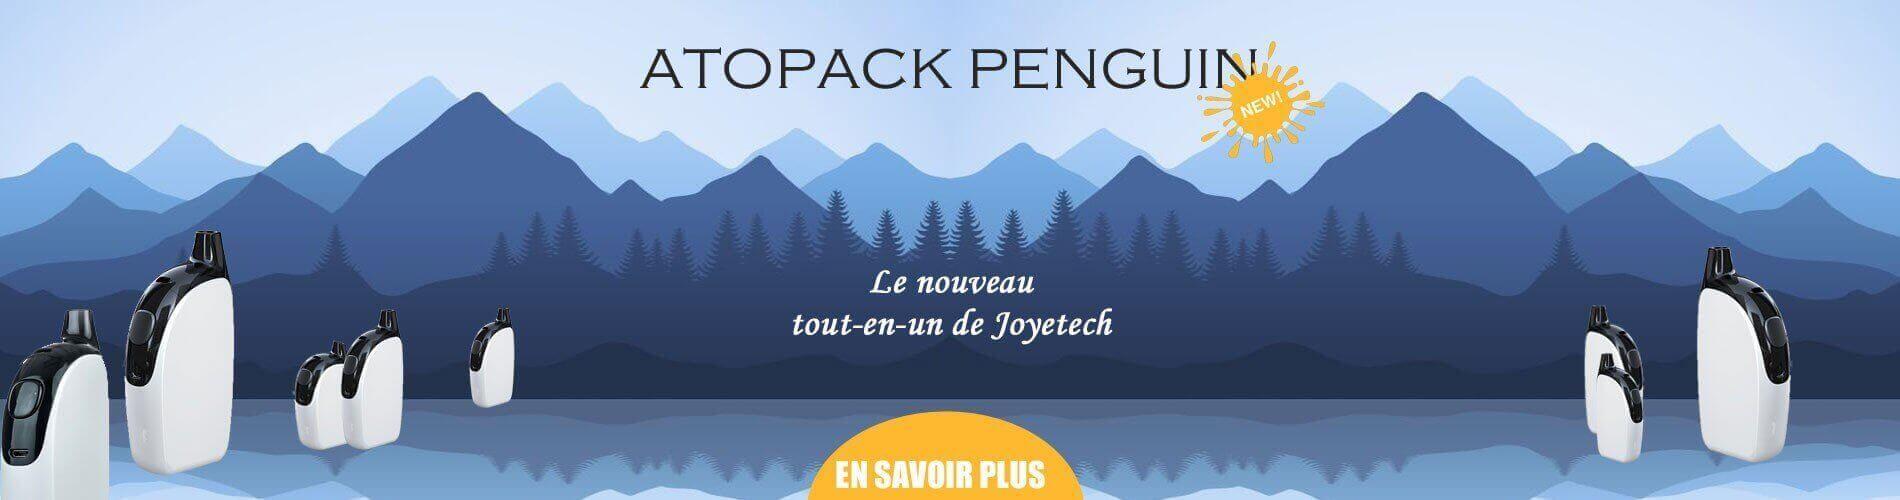 Pinguin ecigarette Joyetech